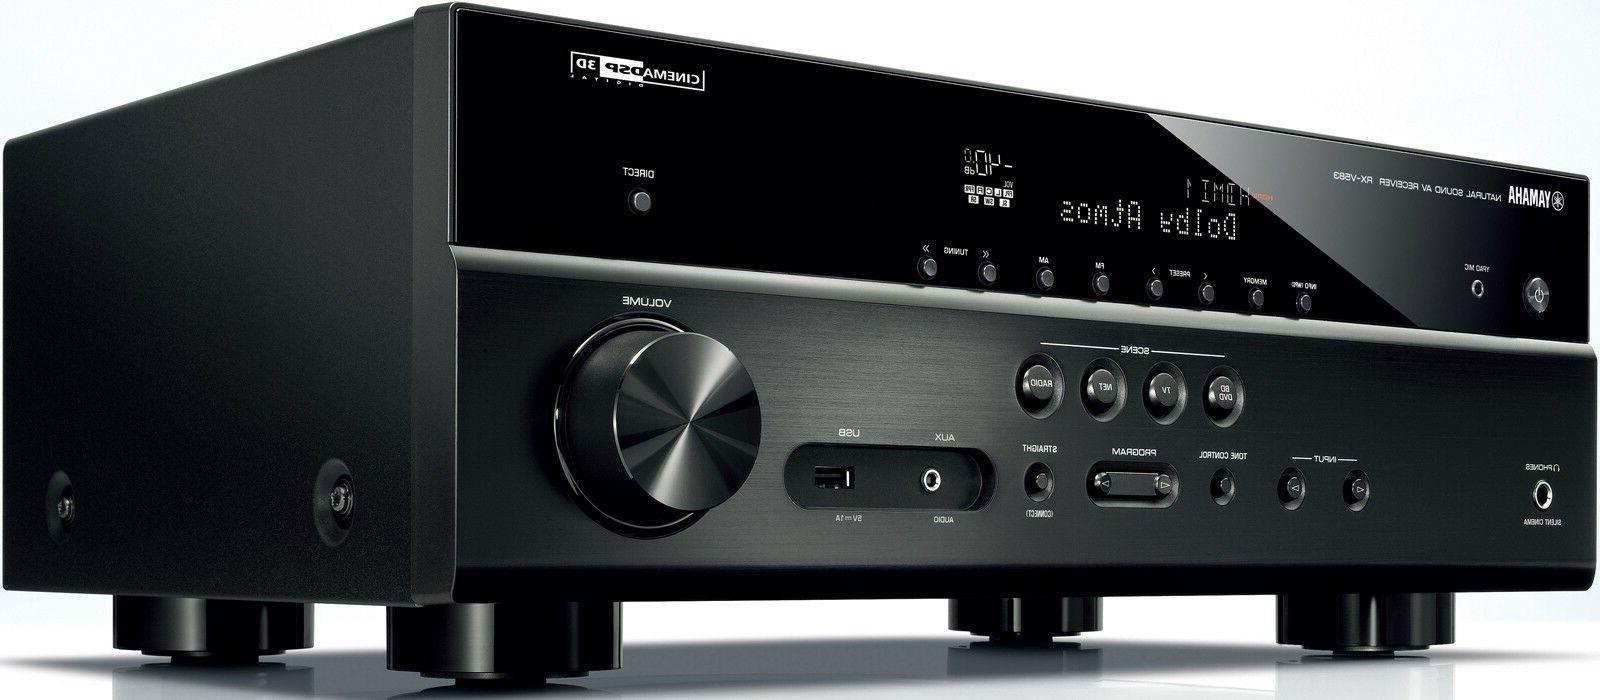 Yamaha RX-V583 Bluetooth Receiver HDR AirPlay Atmos DTS:X